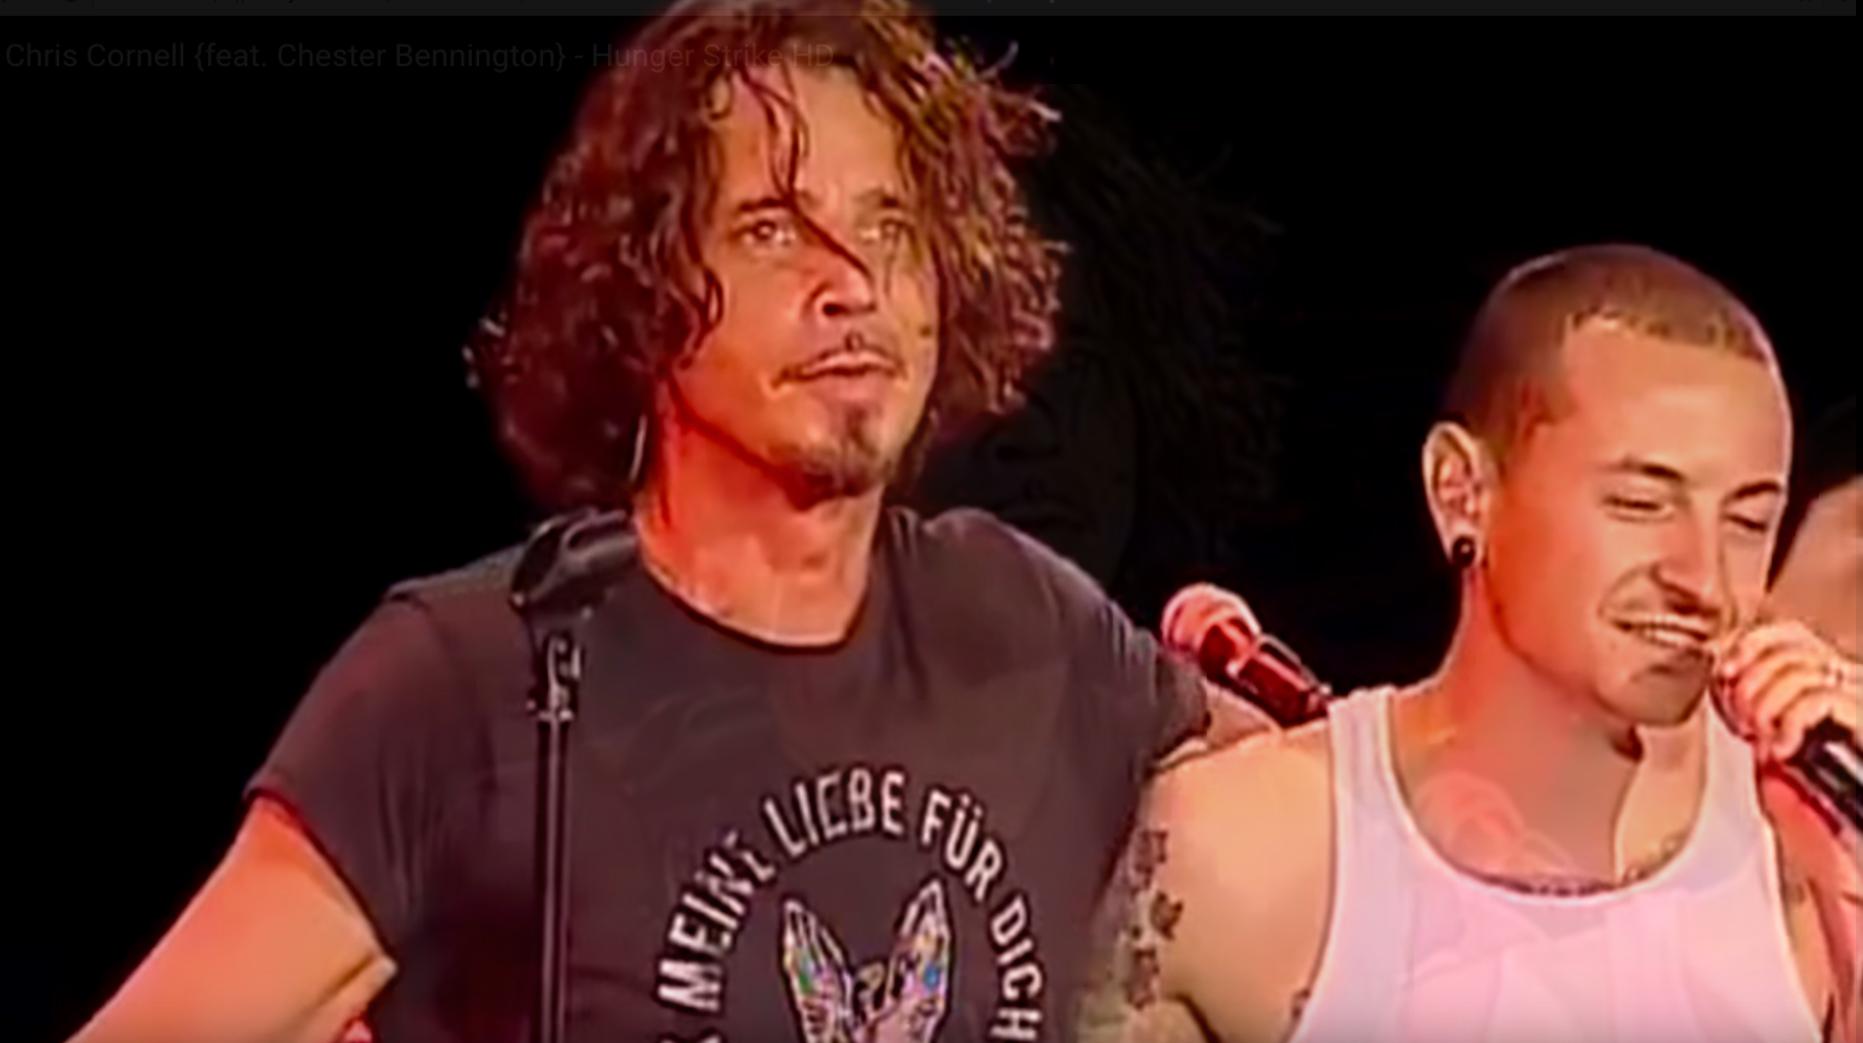 Chris Cornell and Chester Bennington live